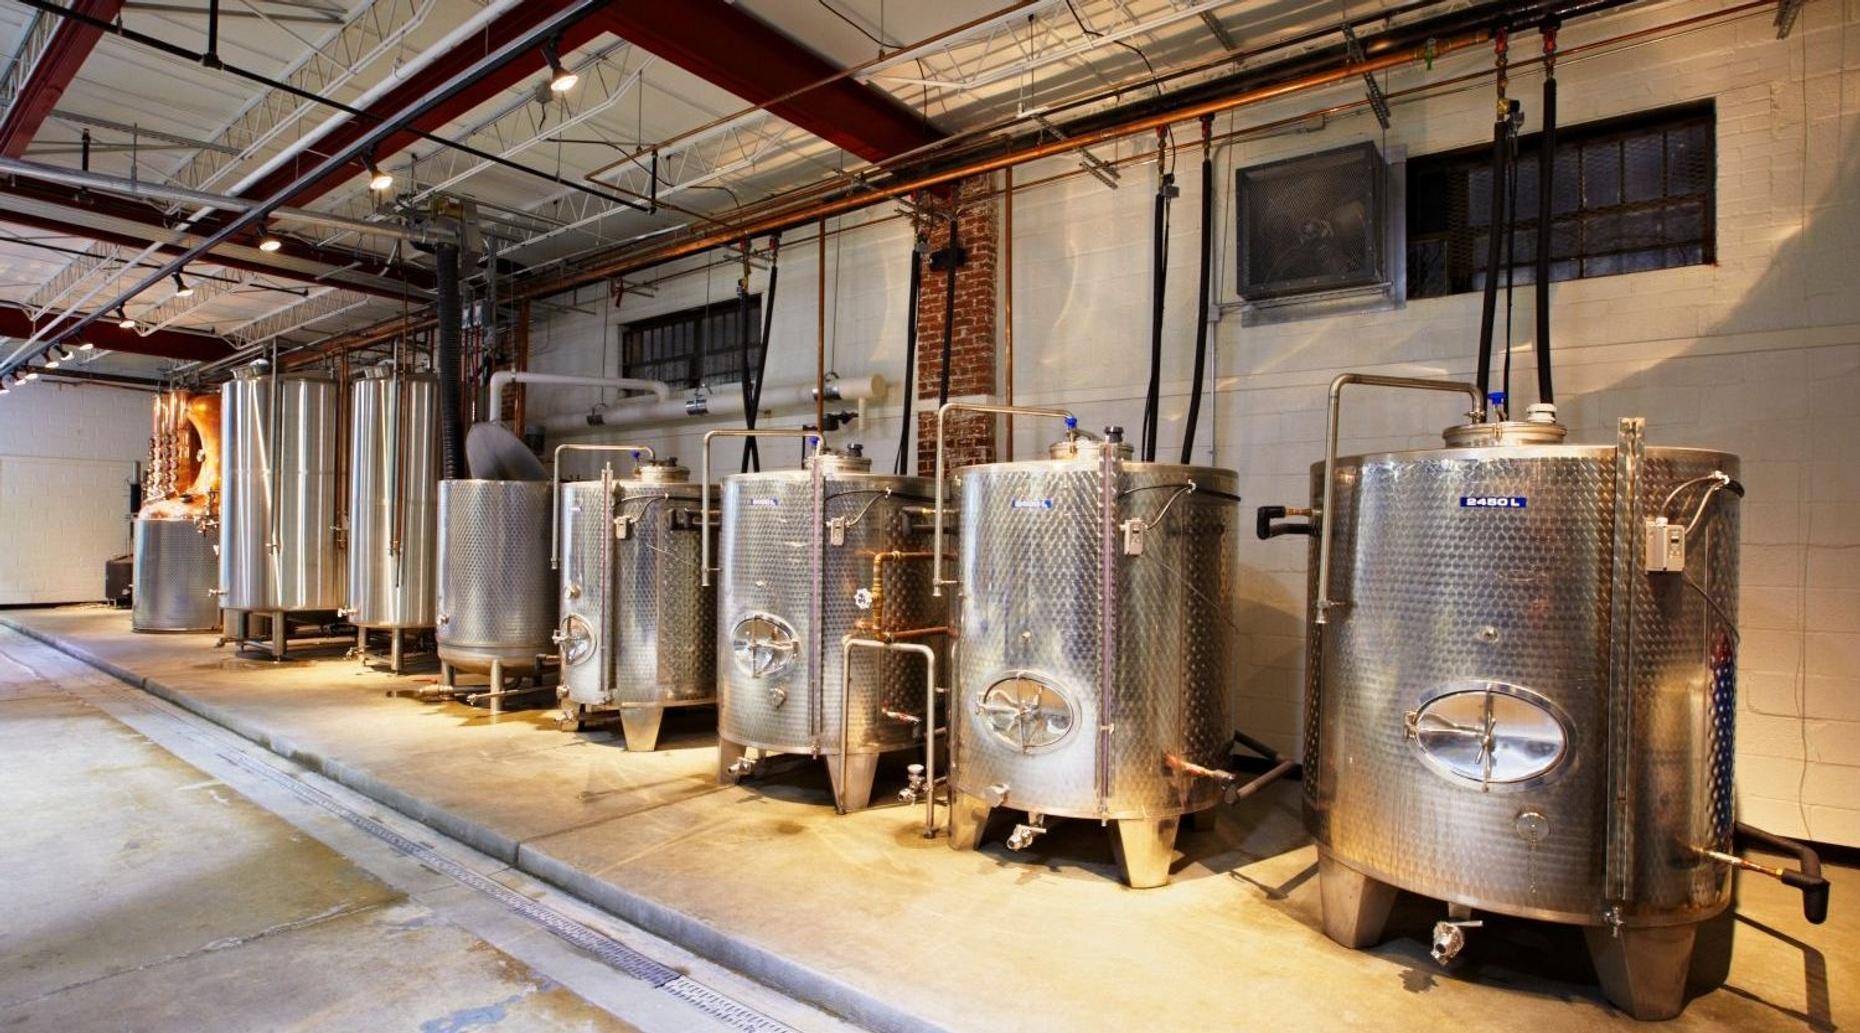 Distillery Tour & Tasting in Washington D.C.